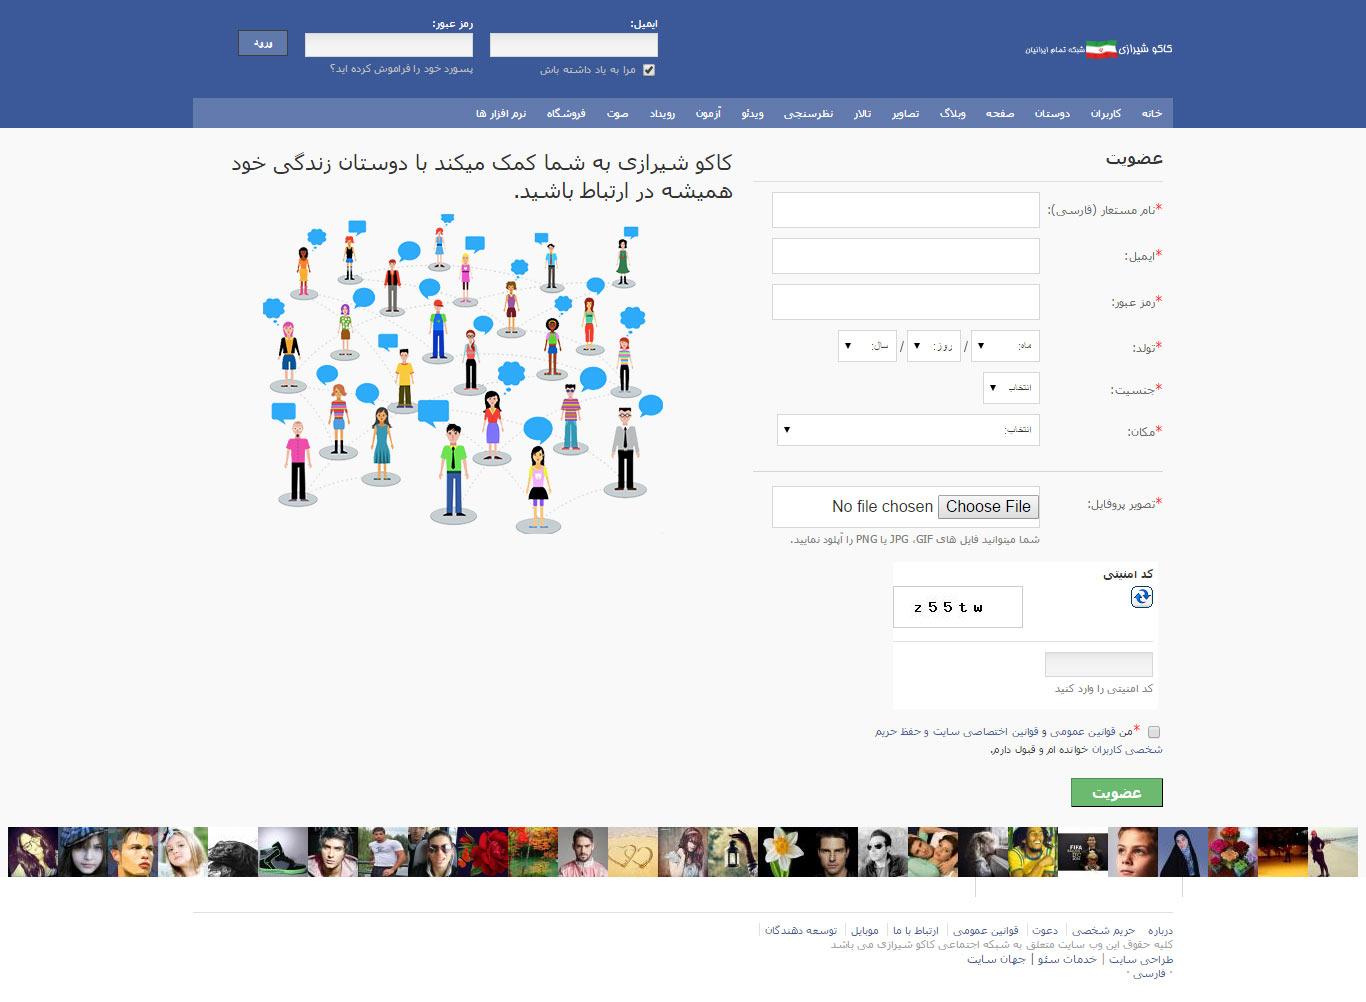 طراحی سایت شبکه اجتماعی